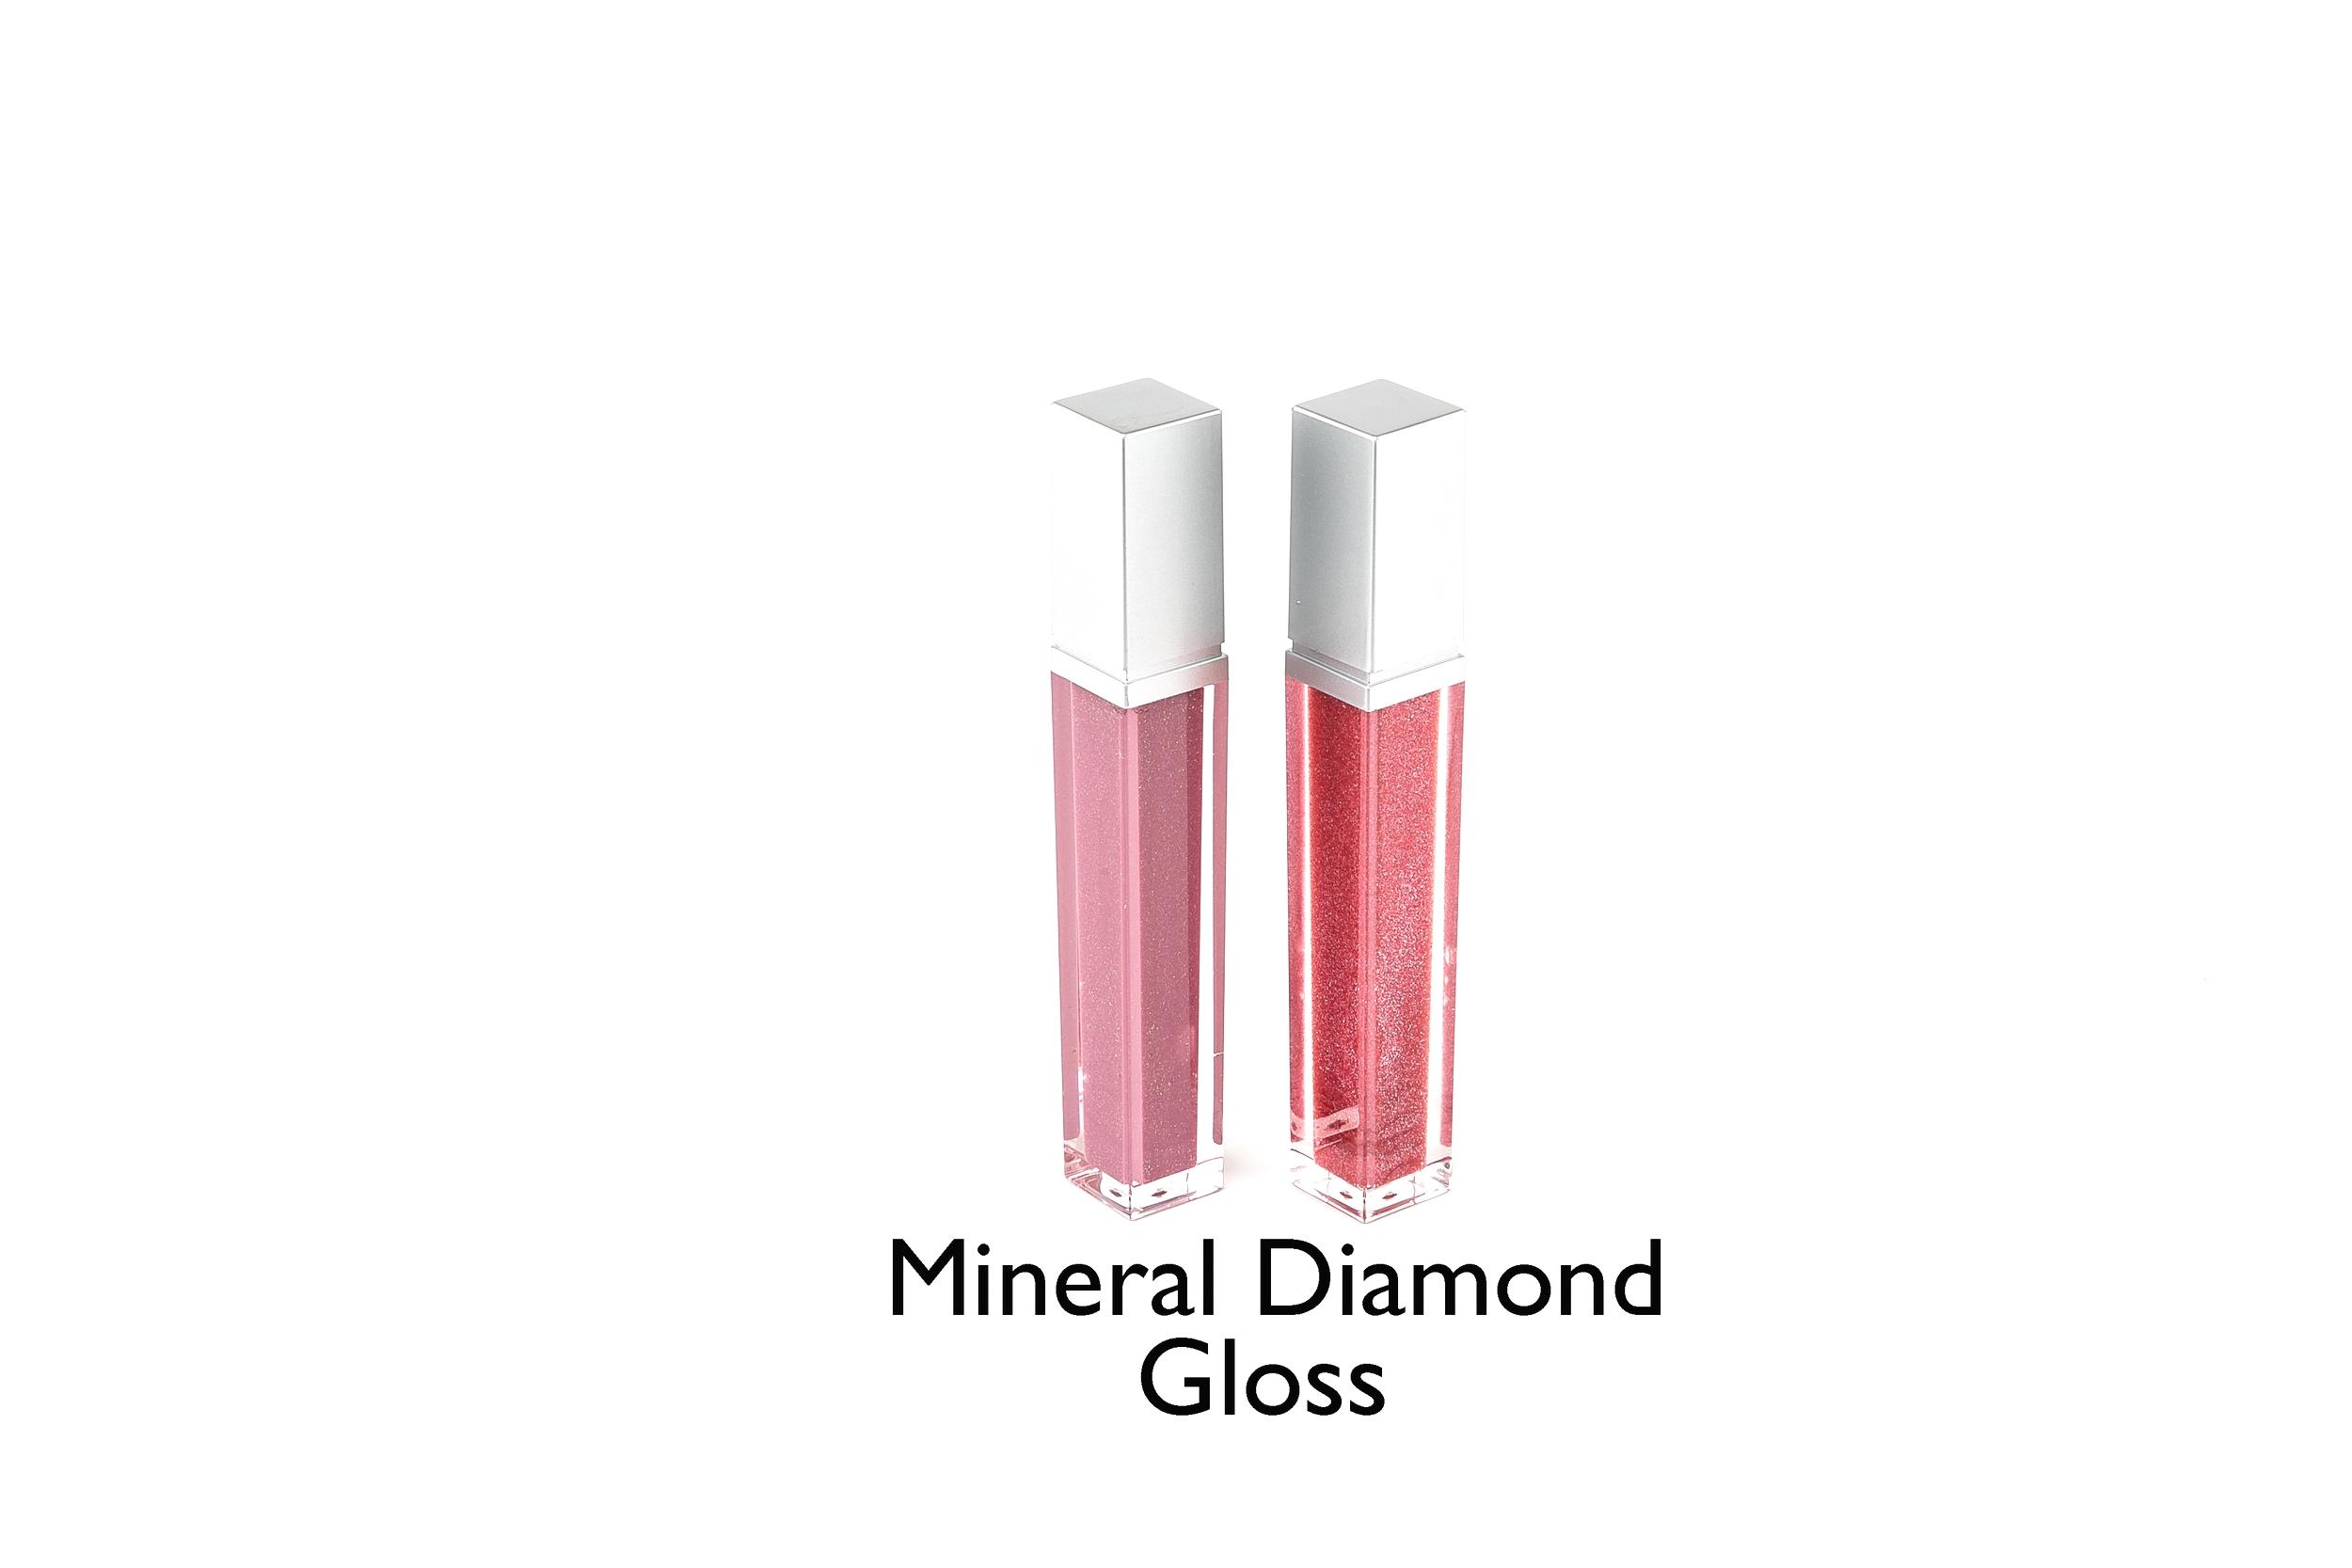 Mineral Diamond Gloss